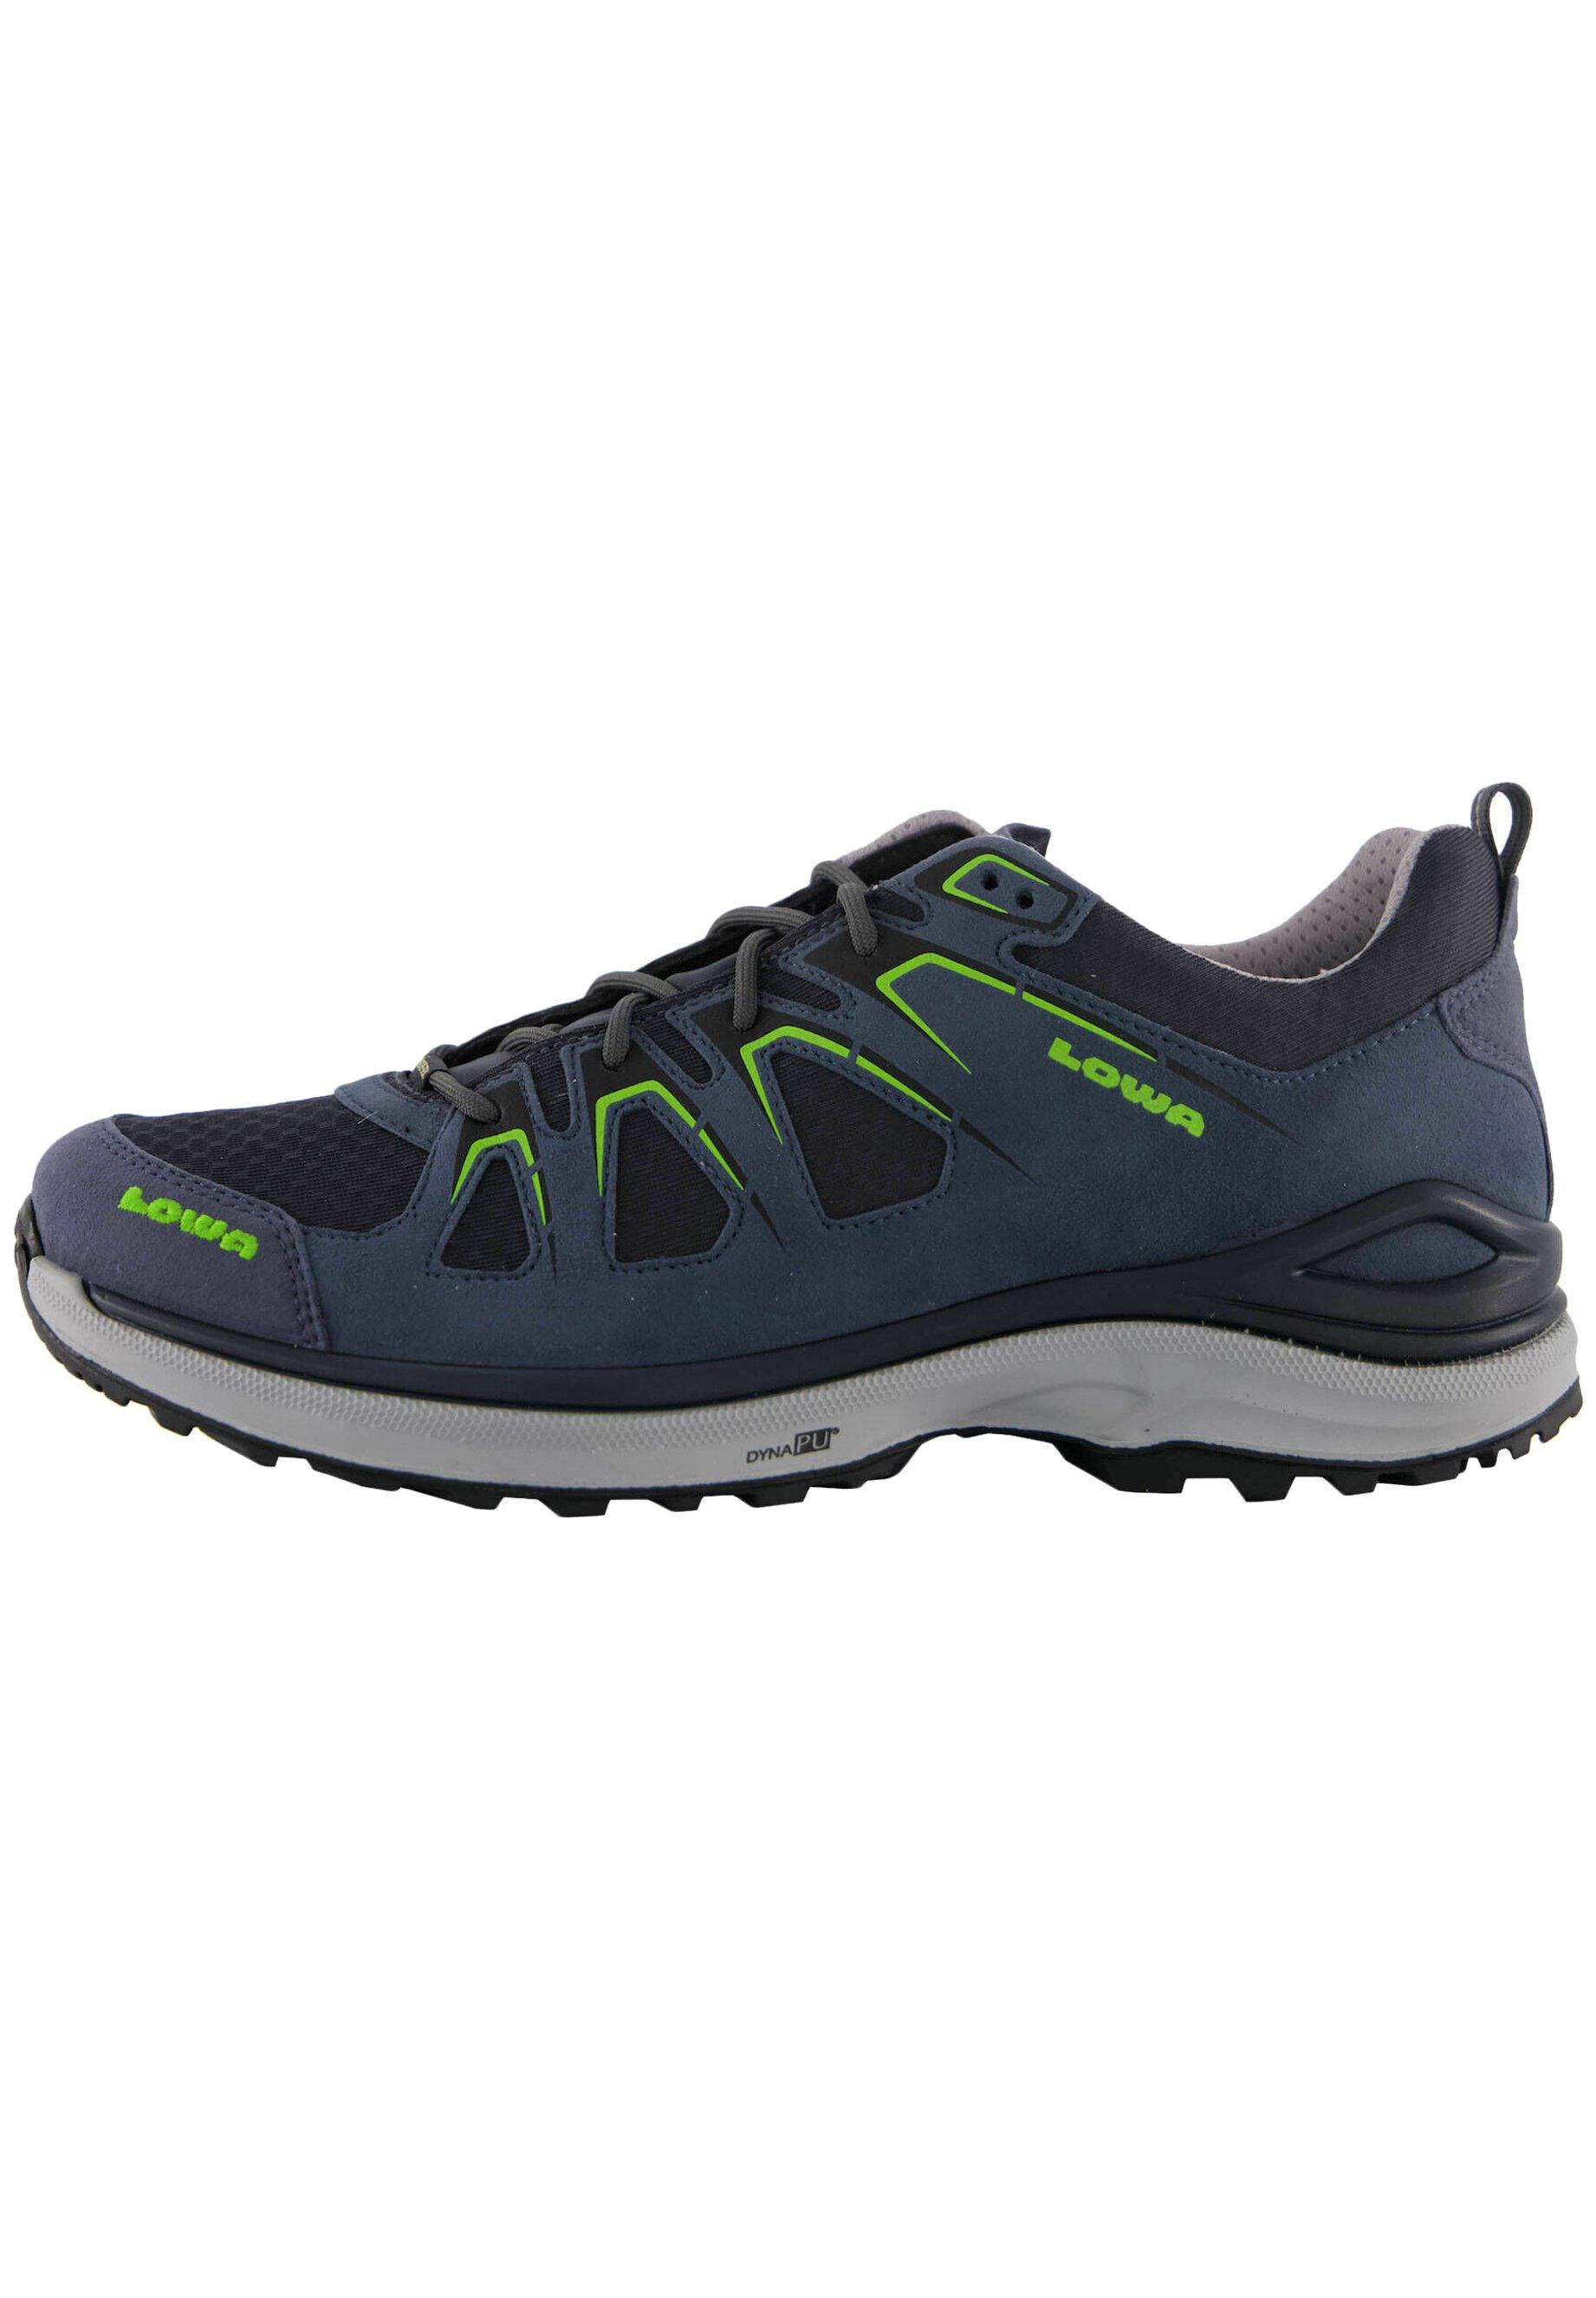 Herren INNOX EVO GTX - Hikingschuh - blau